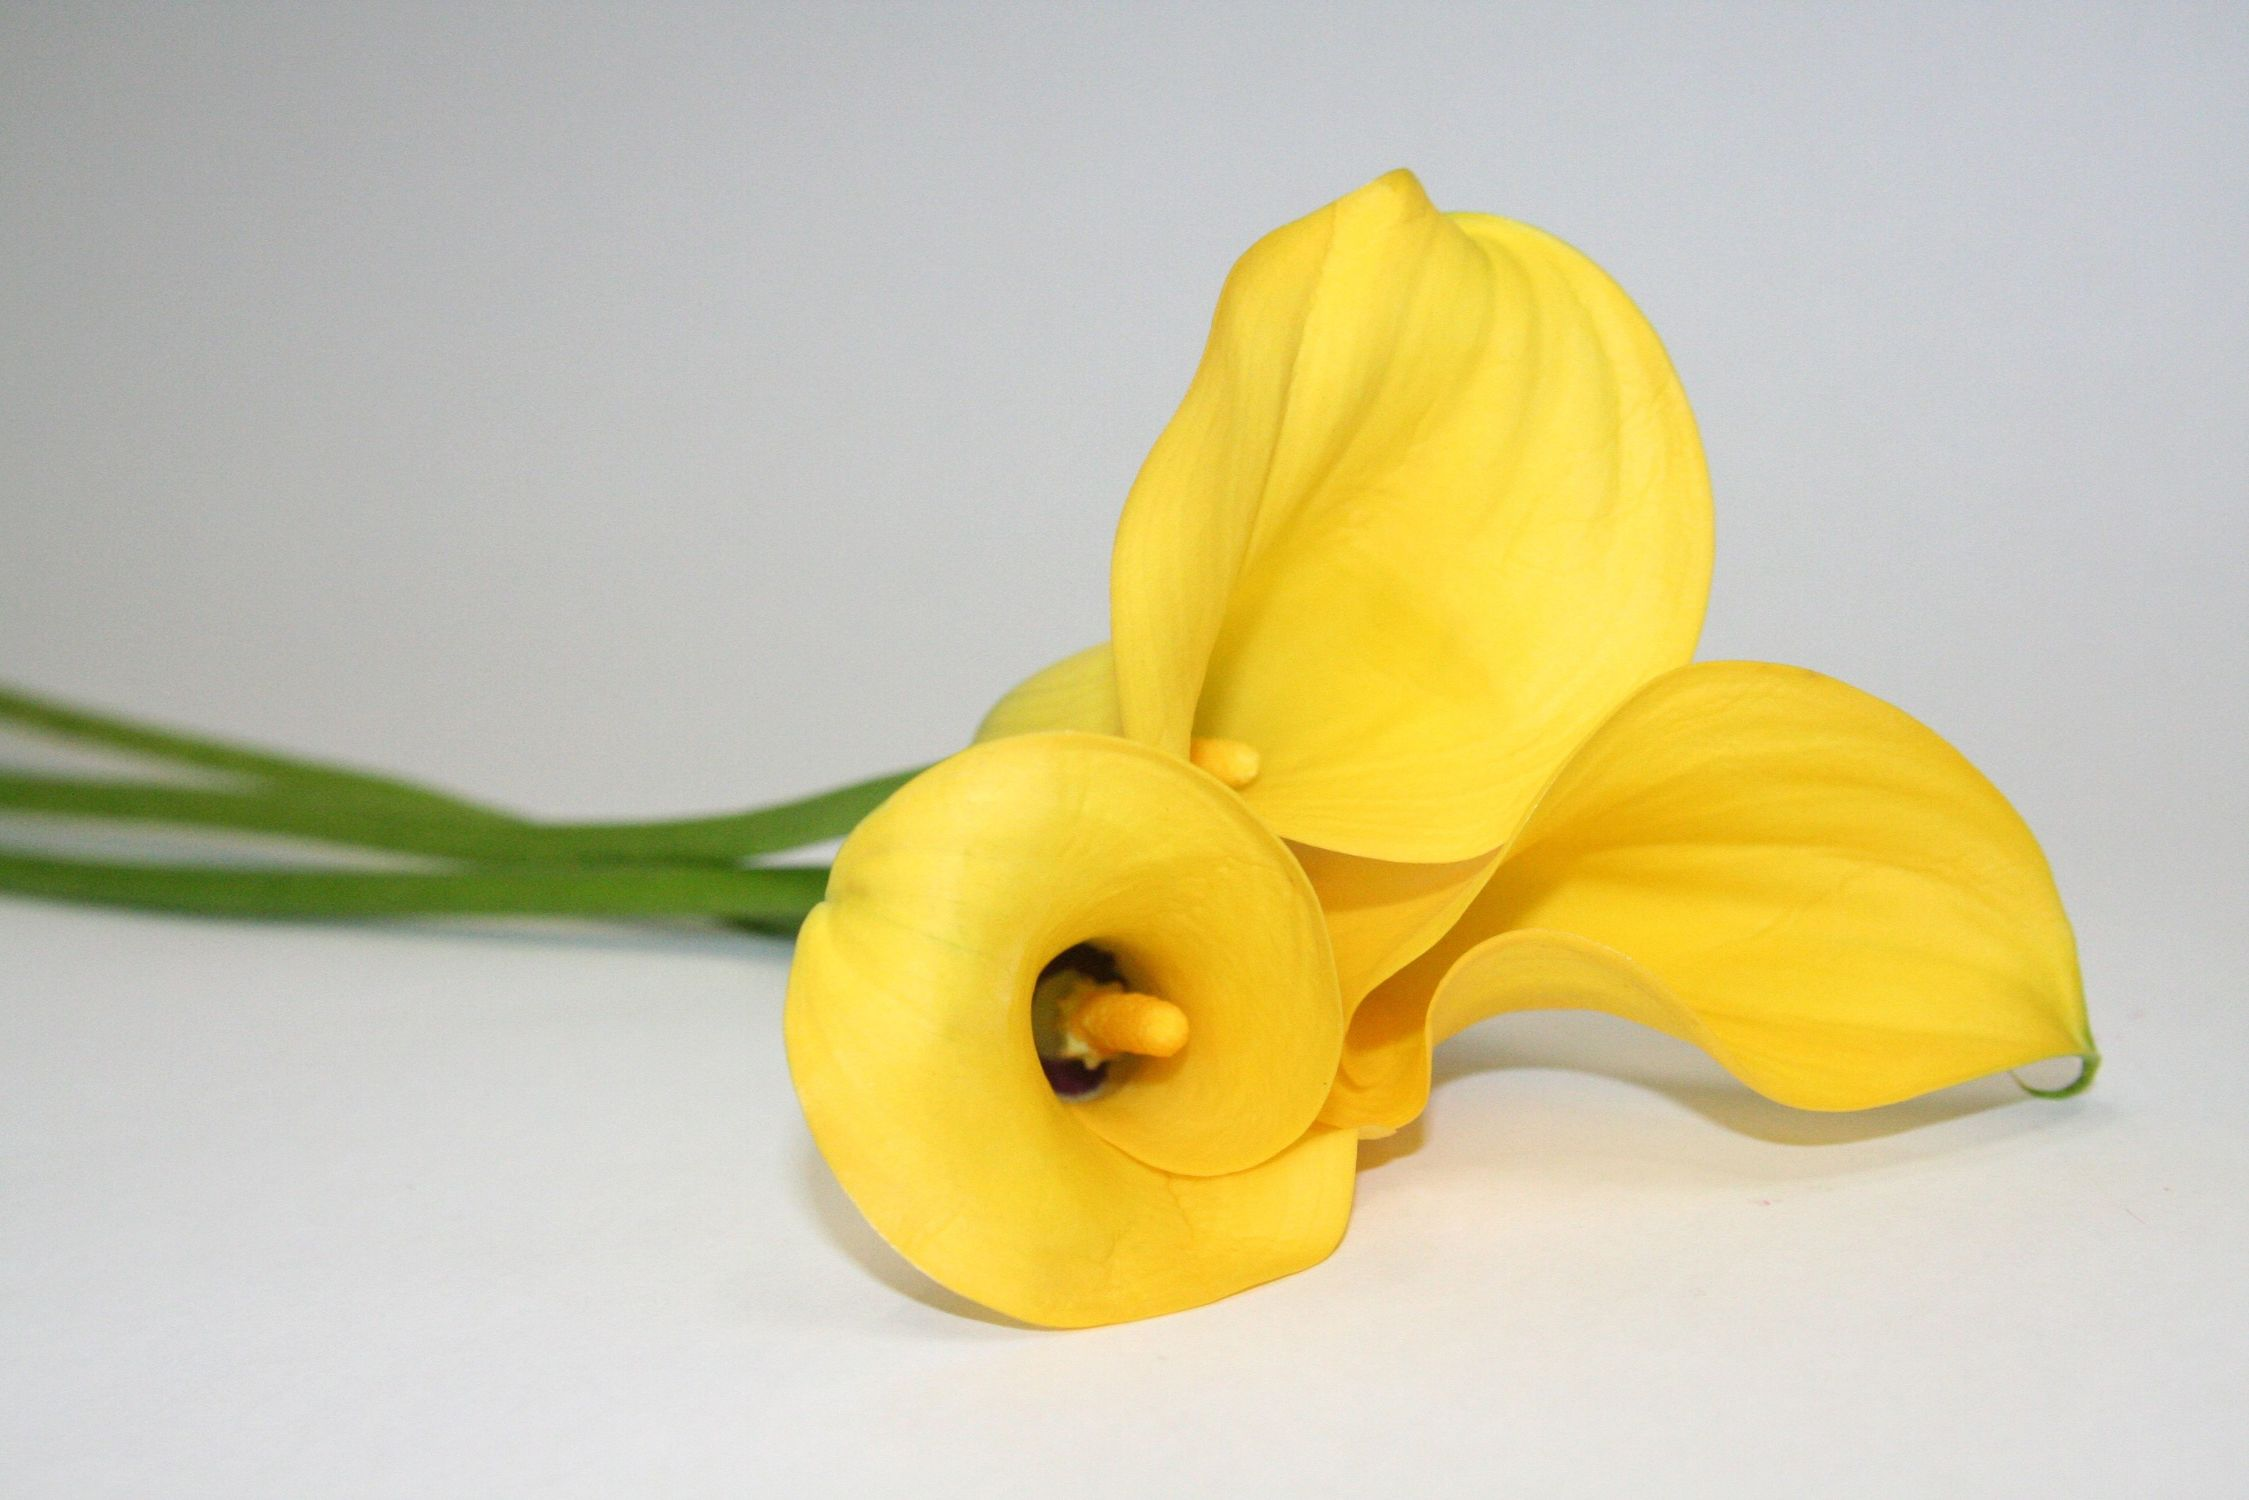 Bild mit Natur, Pflanzen, Blumen, Blume, calla lily, Calla, Zantedeschien, Callas, Kalla, gelbe Calla